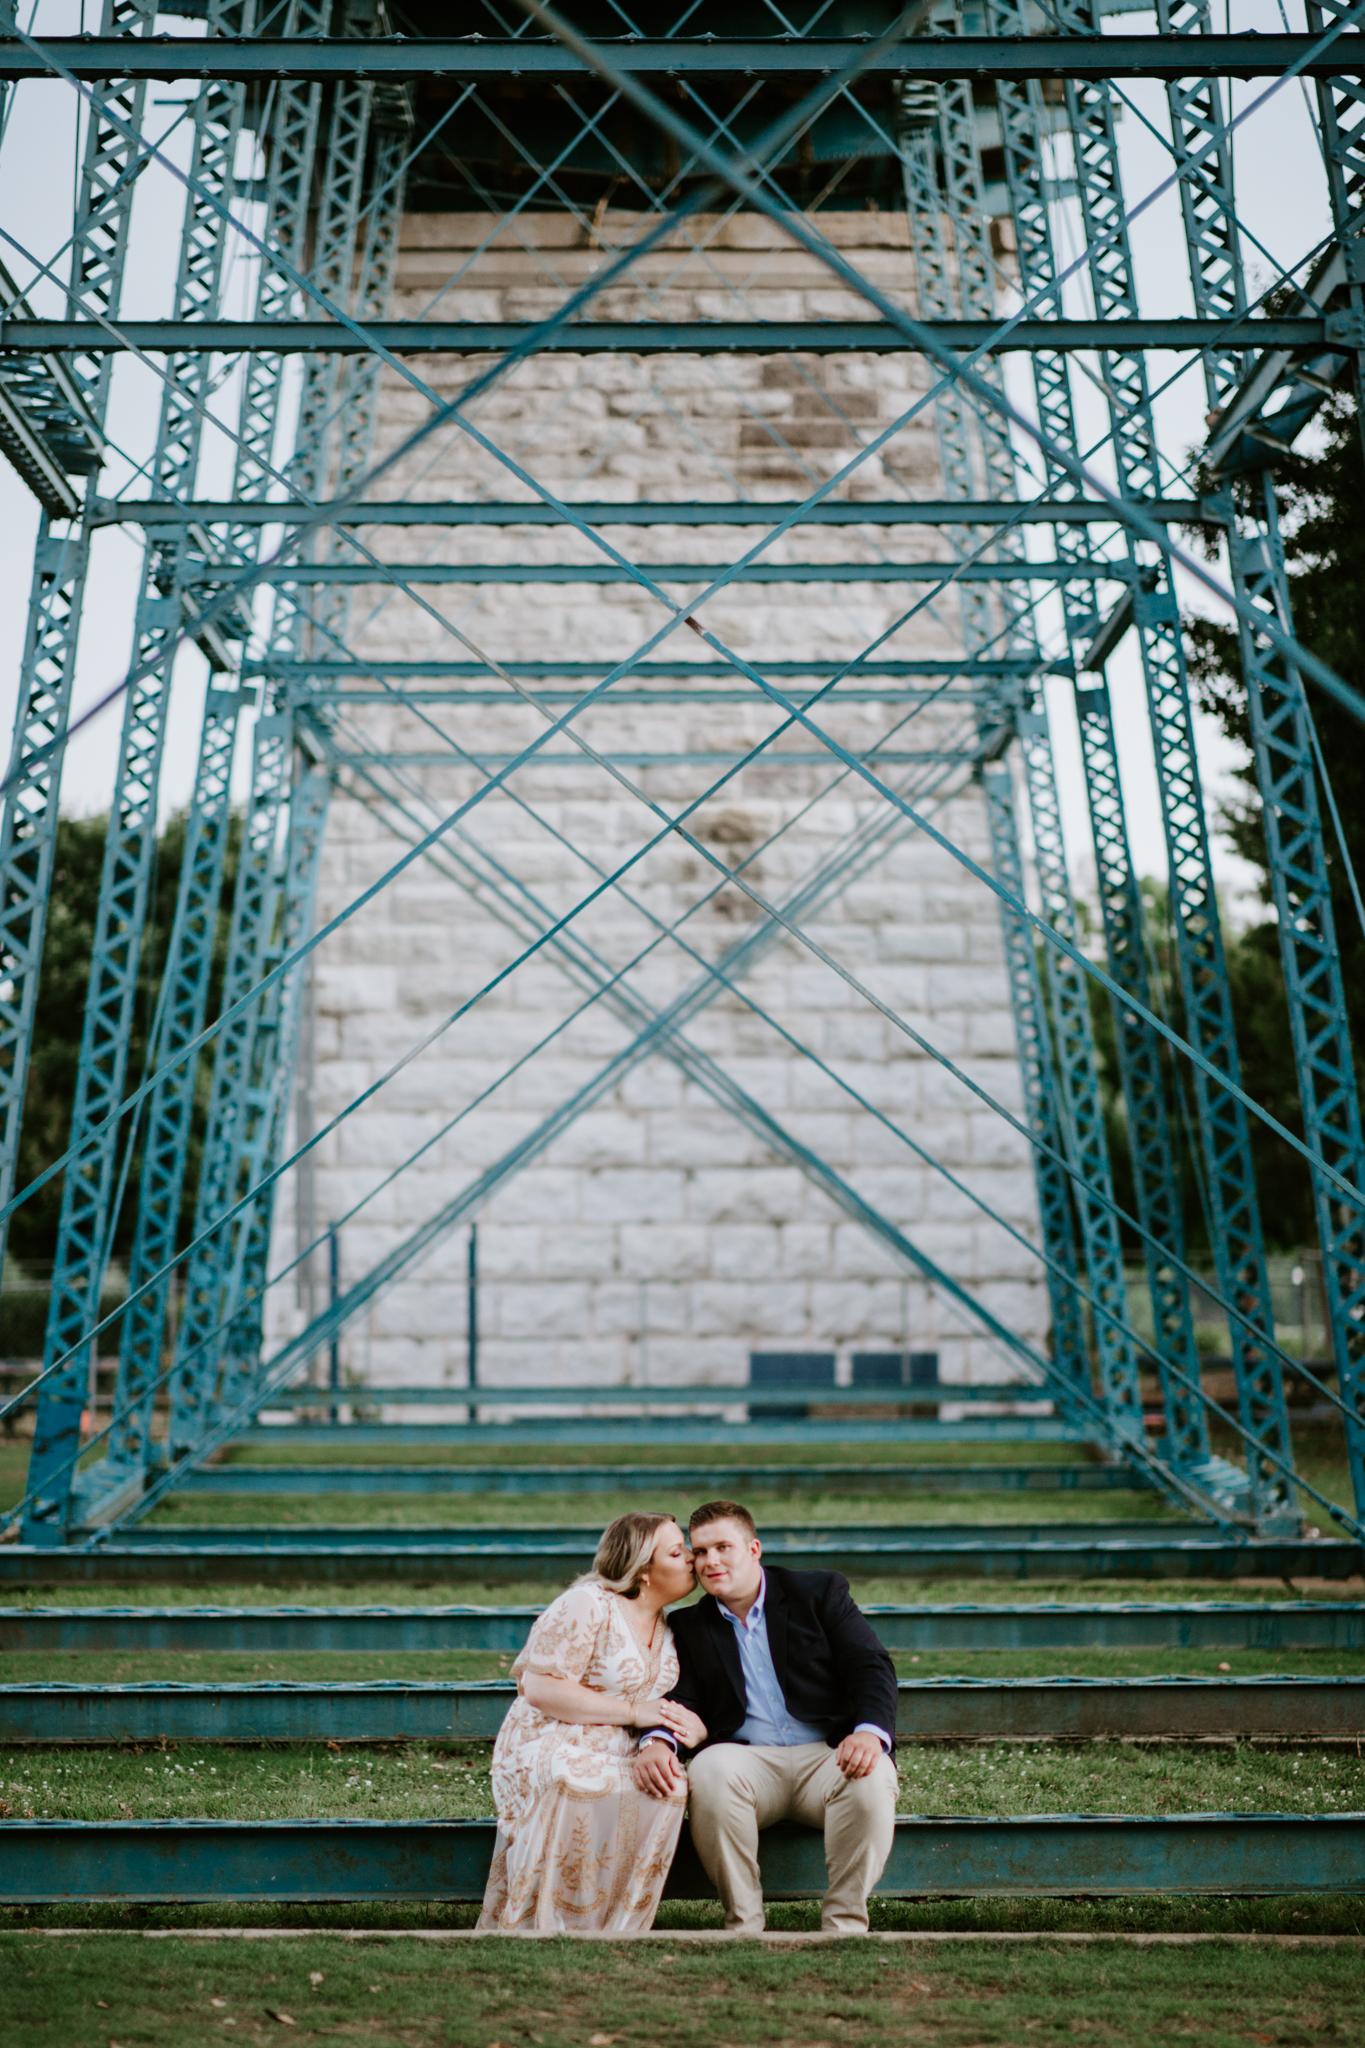 Ryley + Dalton + Chattanooga + Nashville + Knoxville+ Wedding + Engagement + Photographer-65.jpg